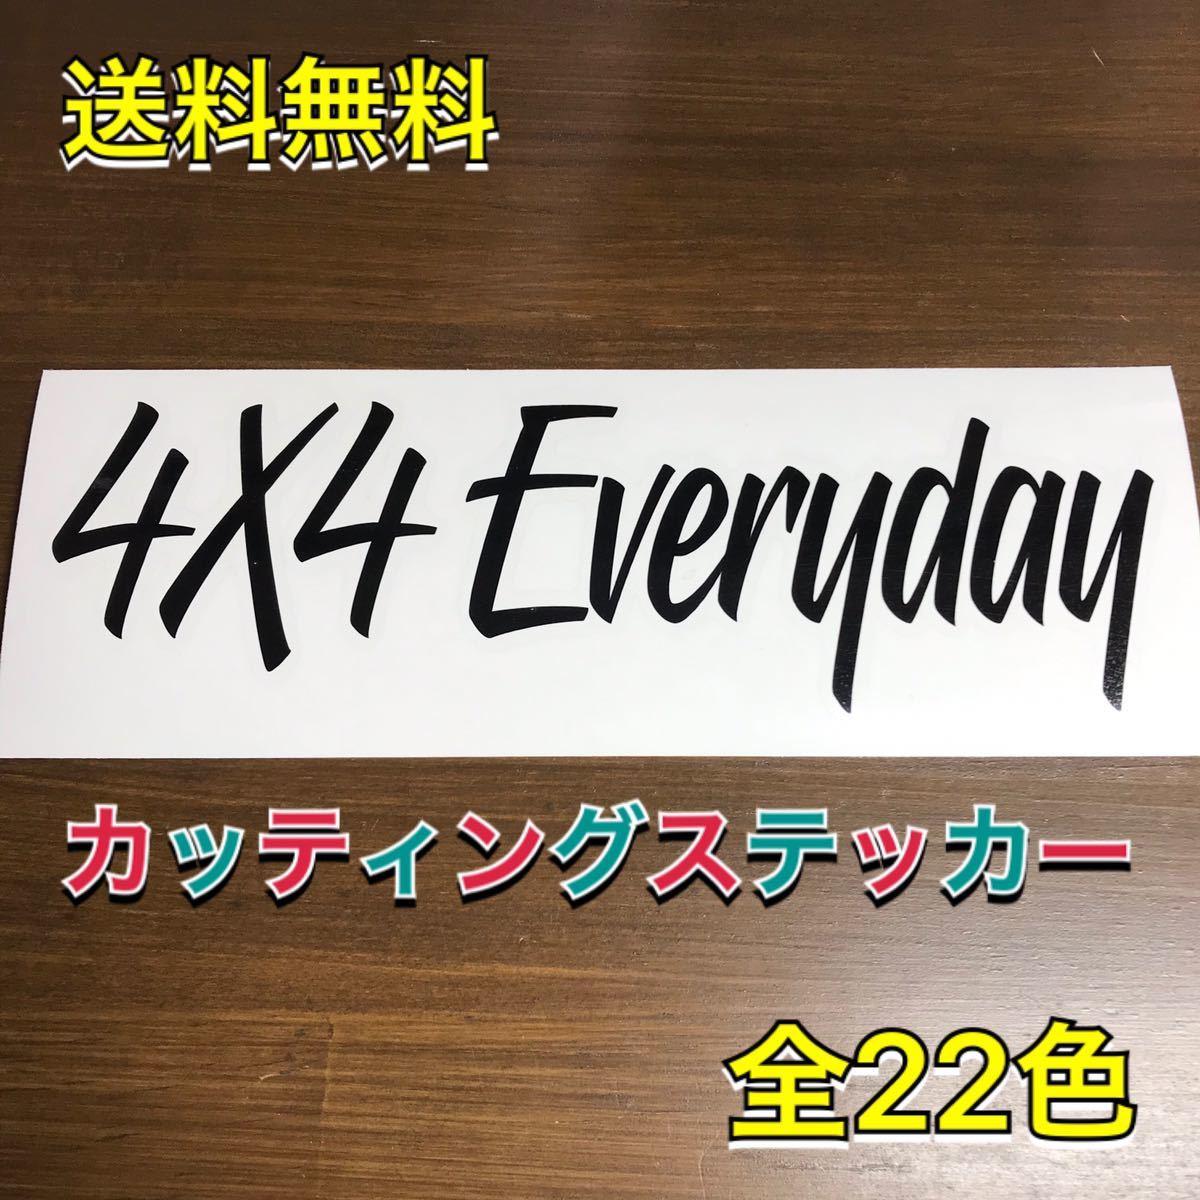 4×4Everyday カッティングステッカー_画像1